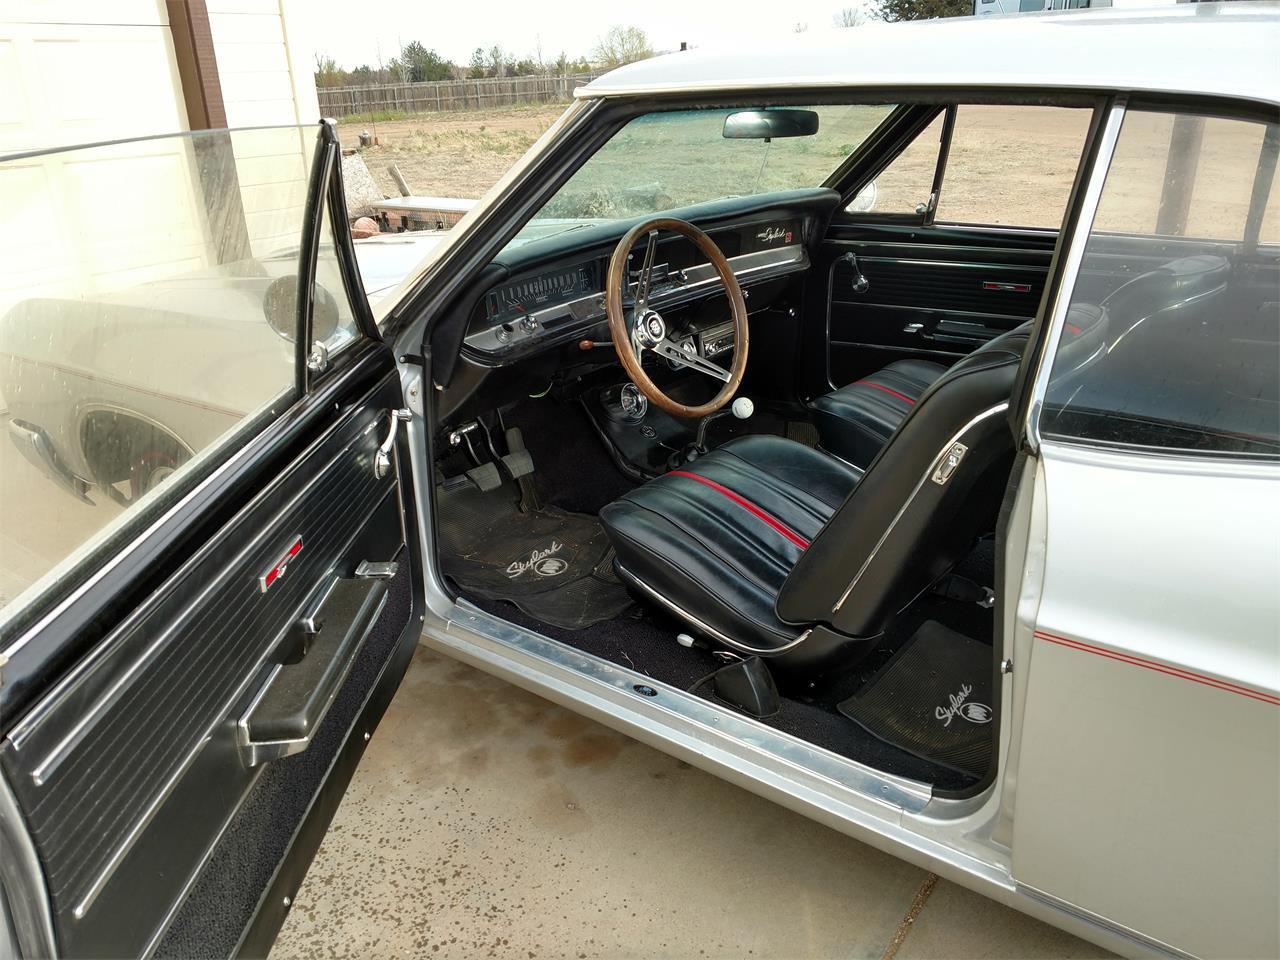 1966 Buick Skylark GS interior